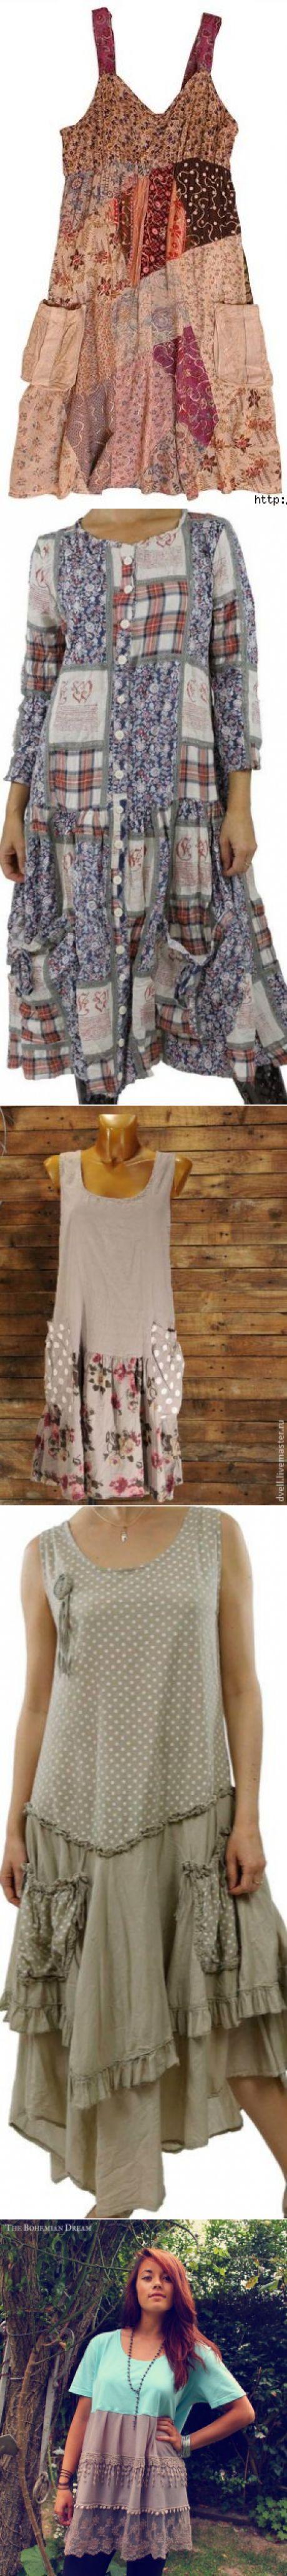 84 Best Images On Pinterest Linen Dresses Clothing Cottonink Floral Harriet Shirt Navy M 2